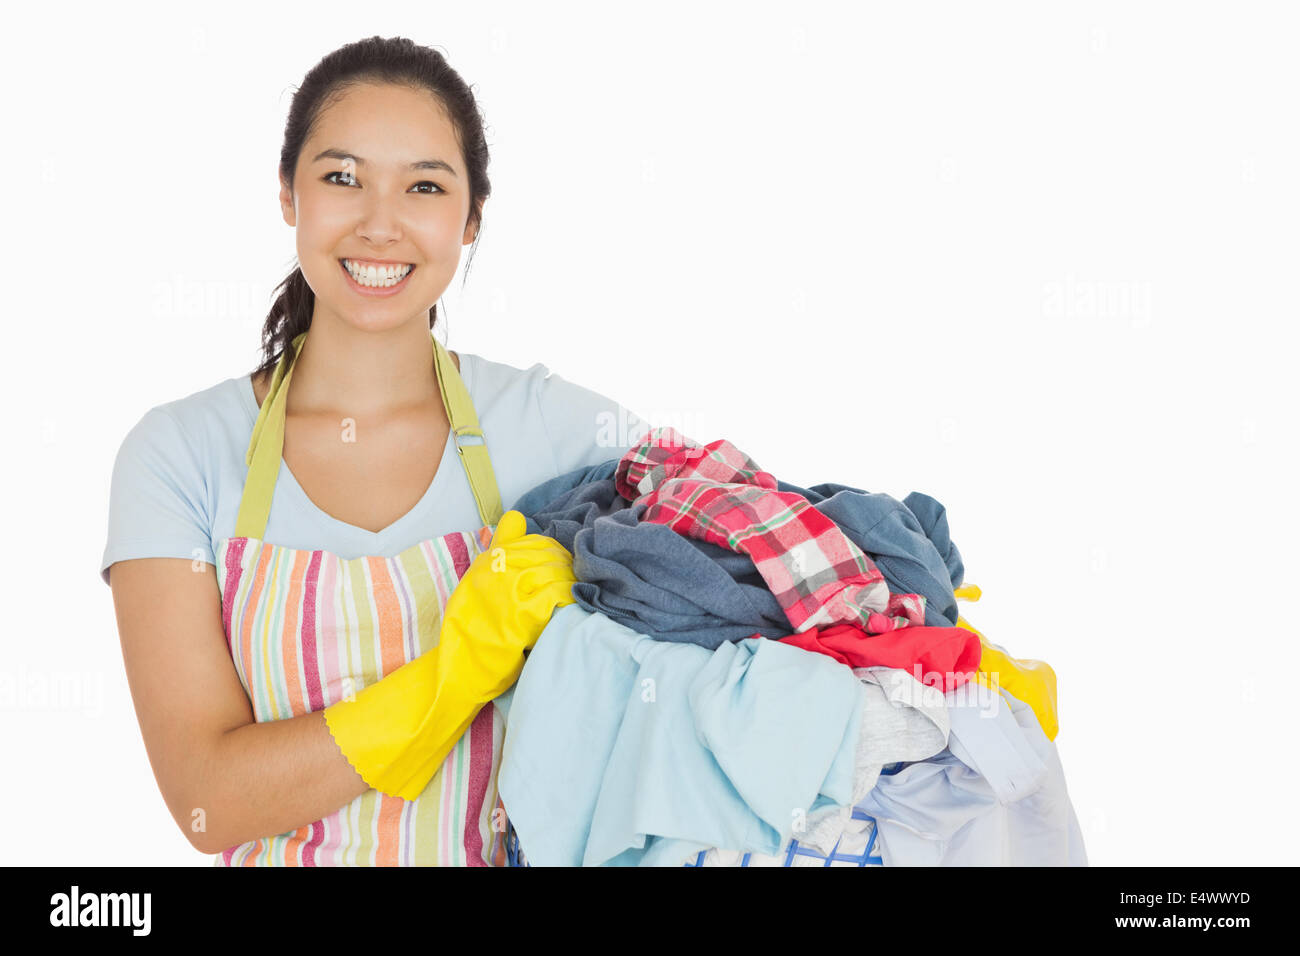 Laughing woman holding laundry basket - Stock Image